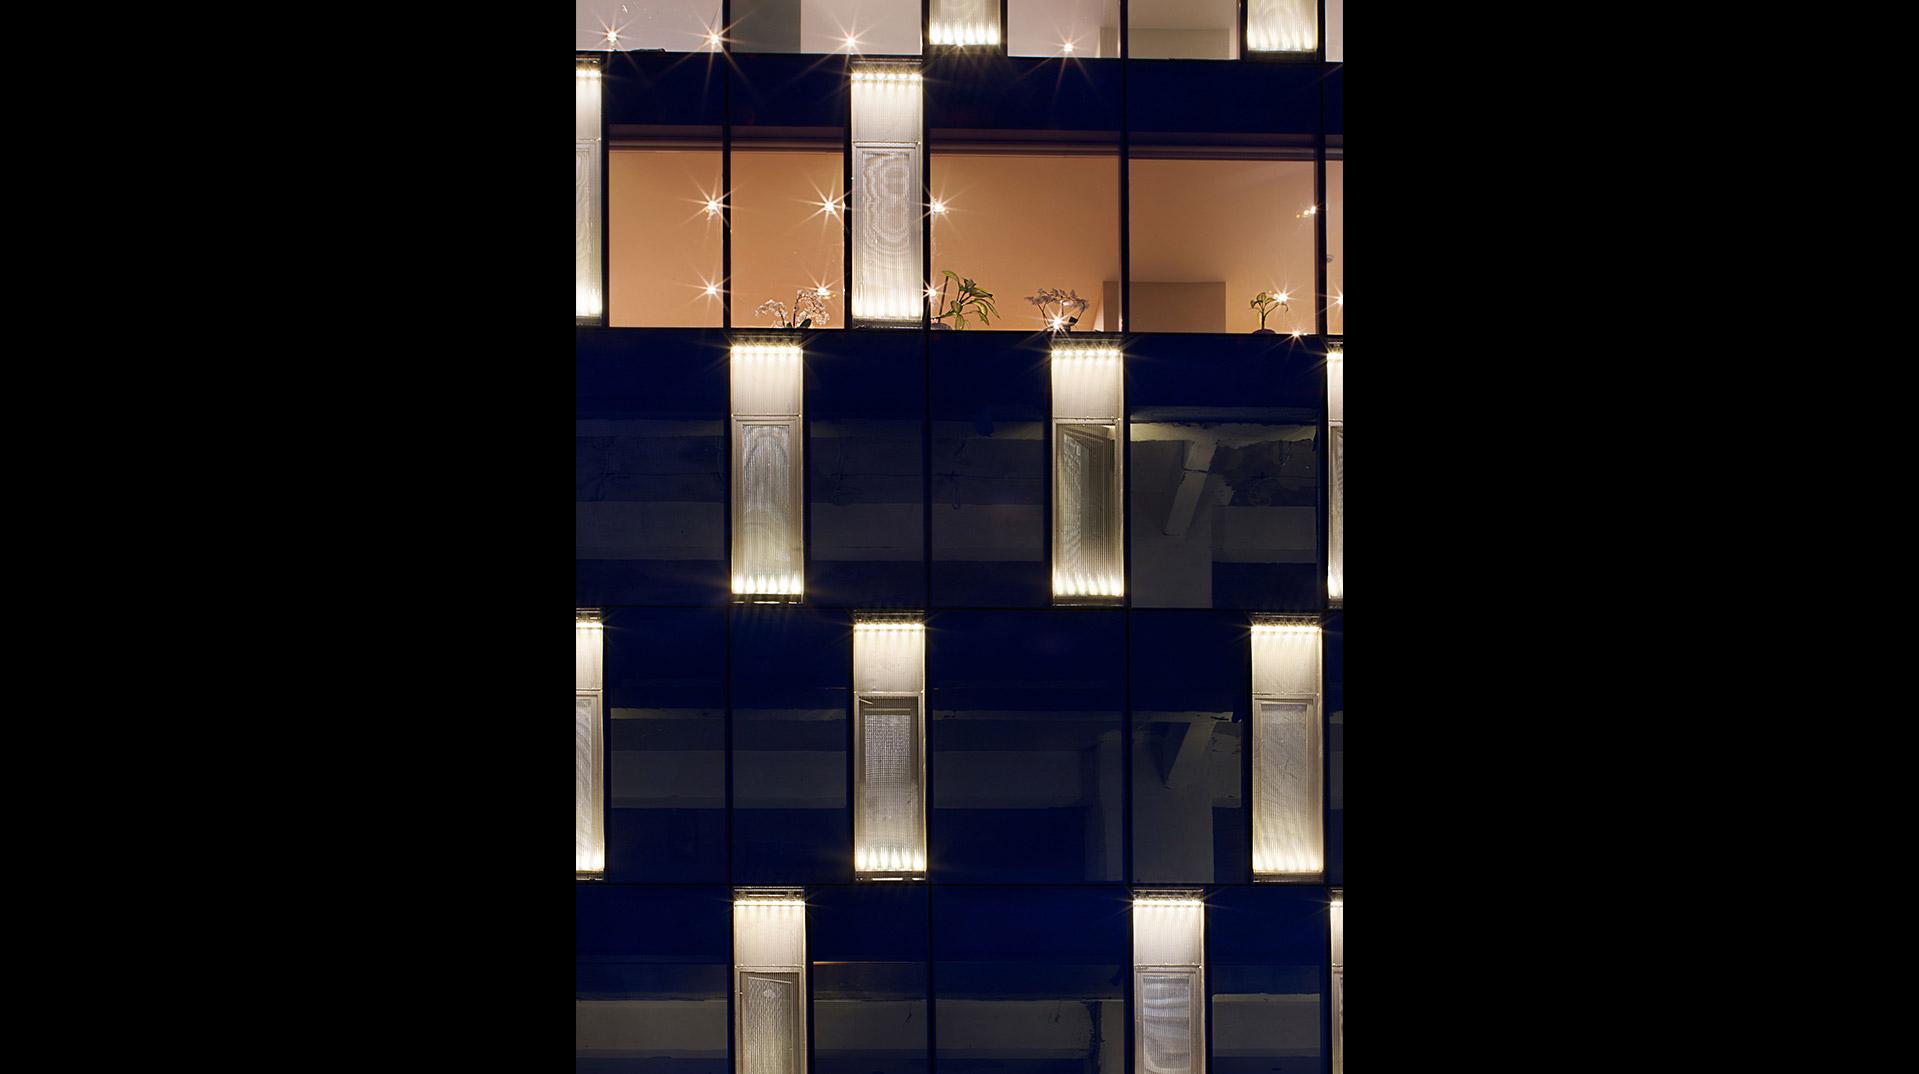 Avciarchitects Summa Office Design